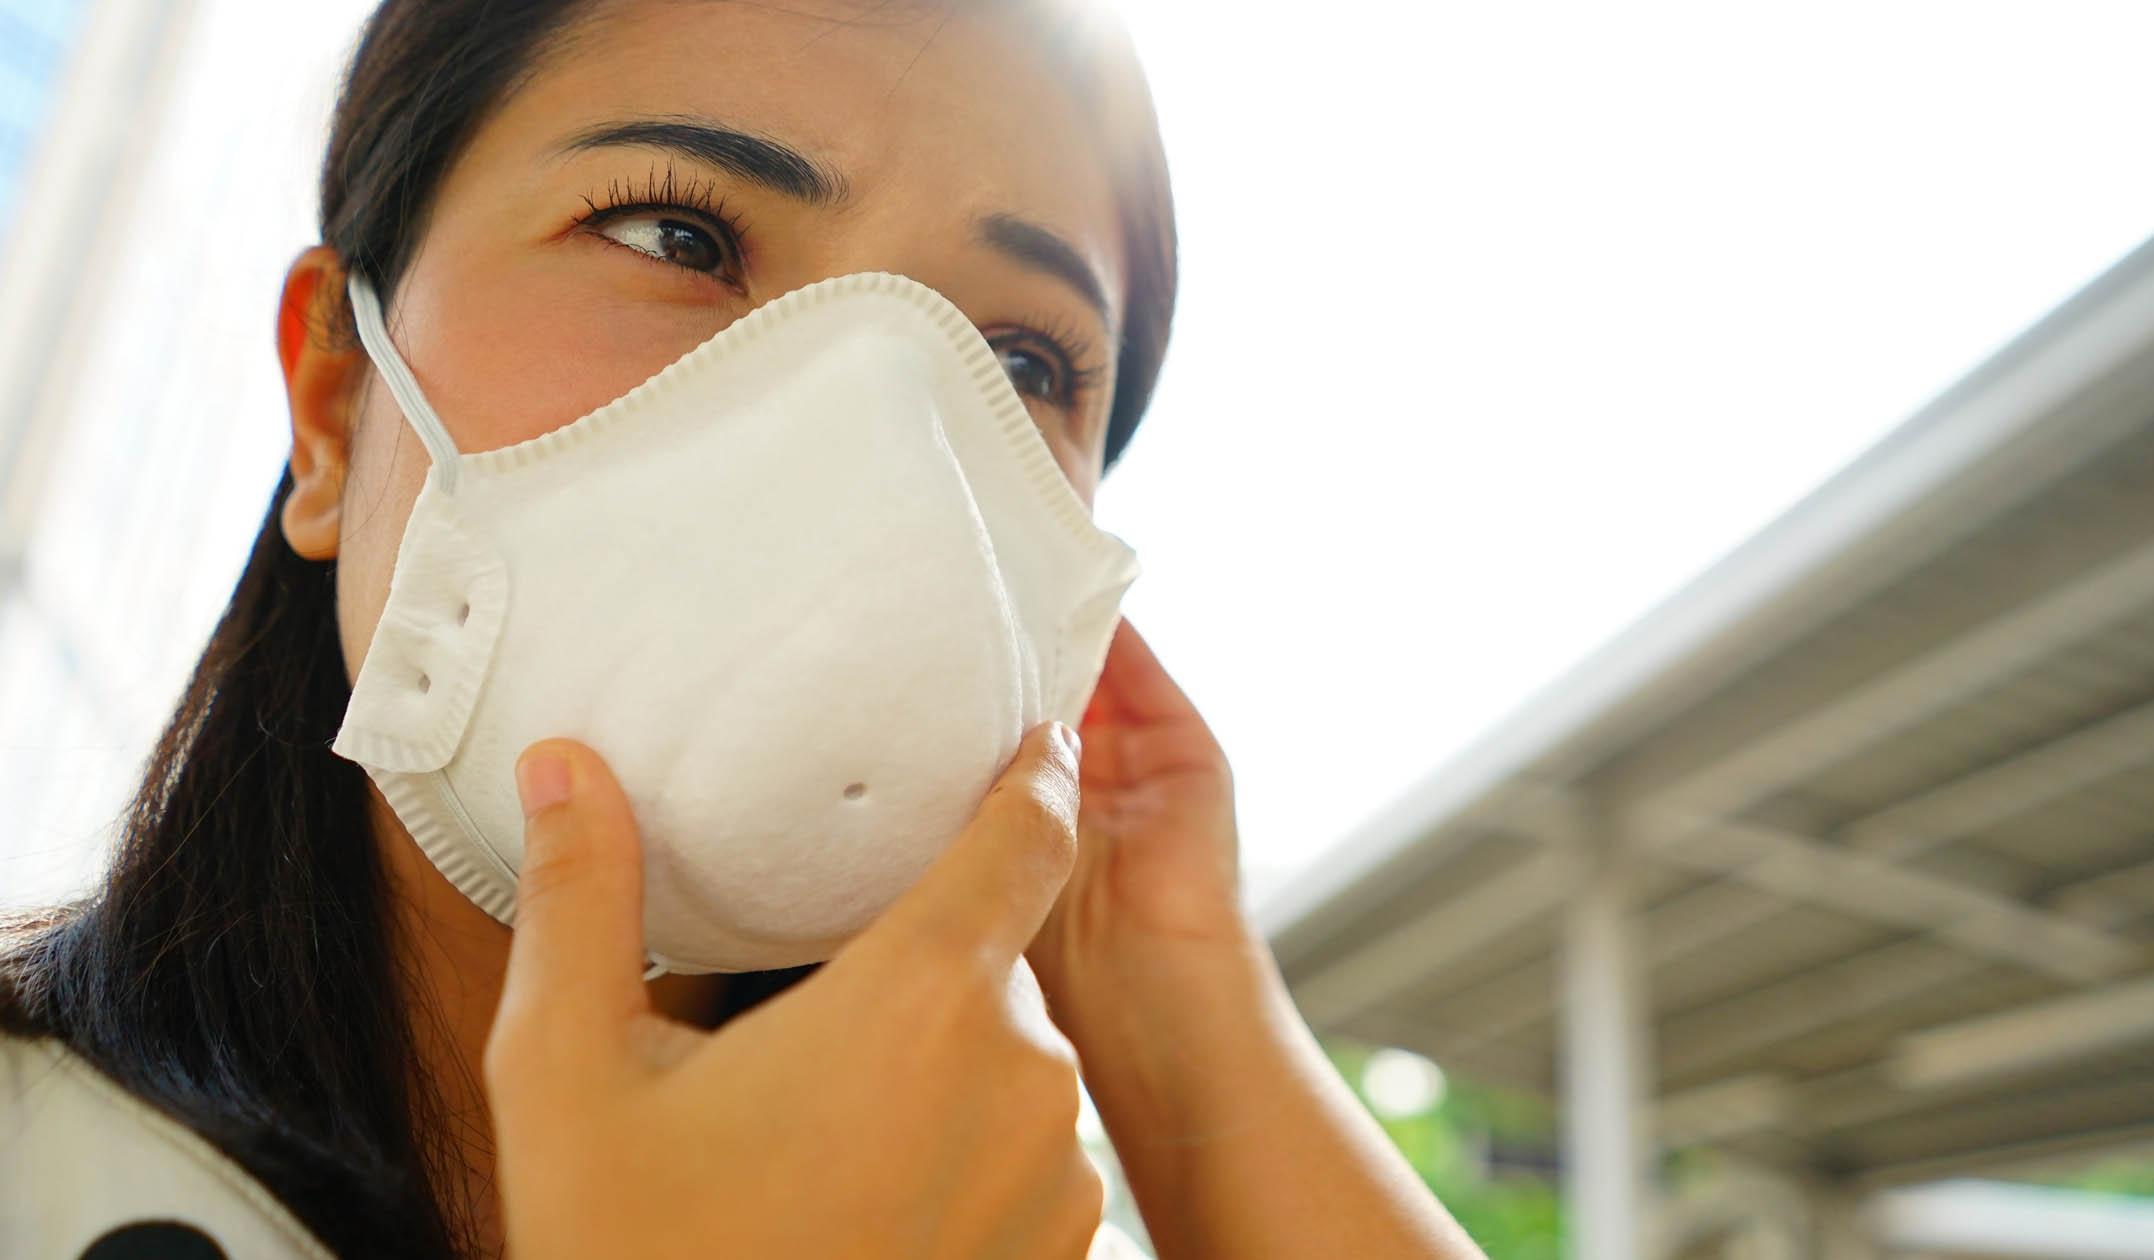 Kulitmu vs. Polusi Udara